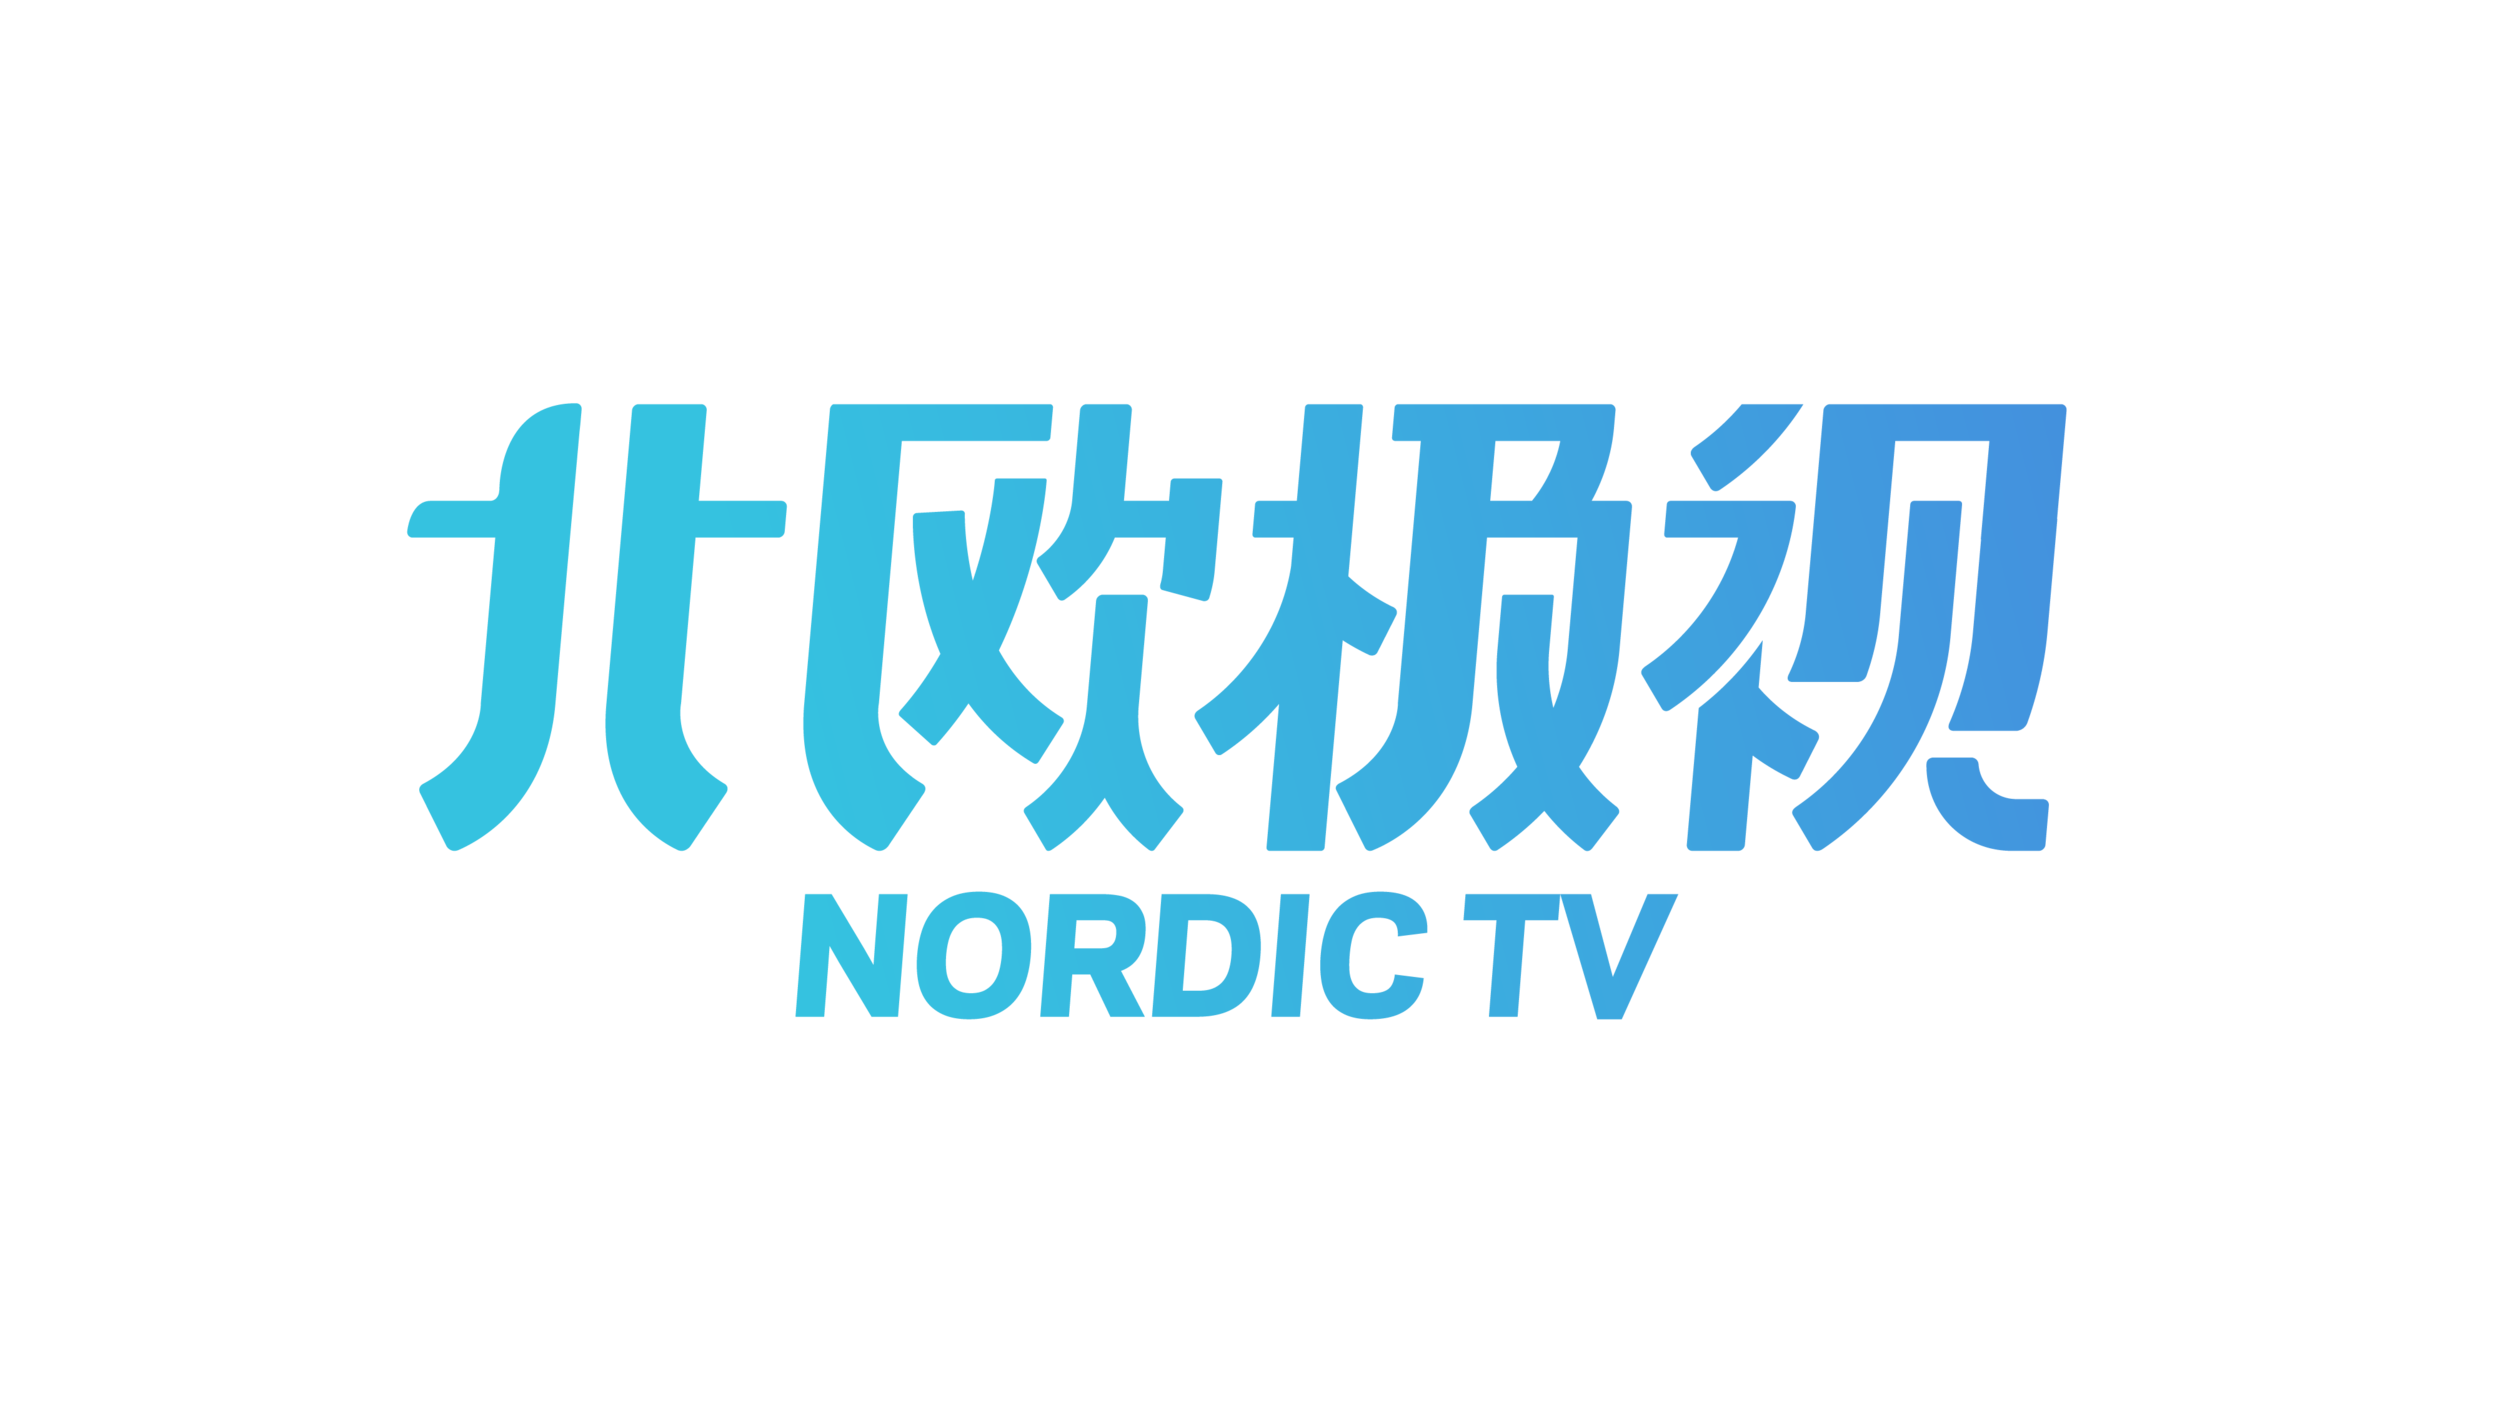 NordicTV_logo_centered_gradient-20.png